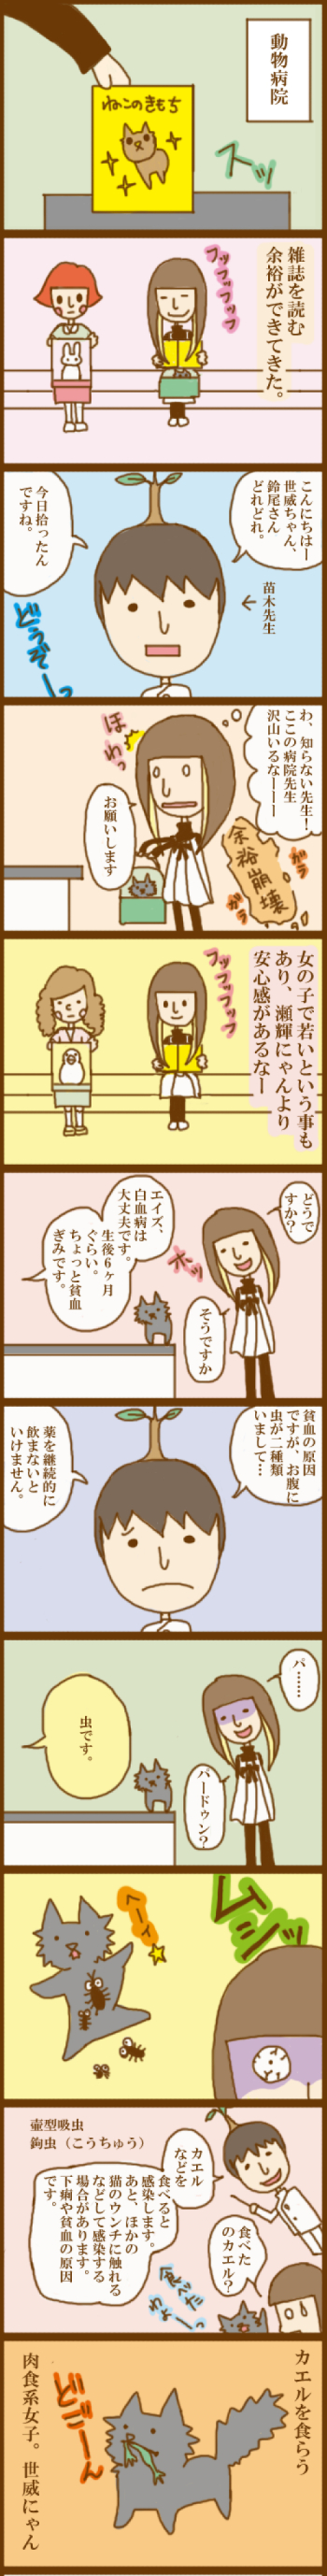 f:id:suzuokayu:20201017204900j:plain